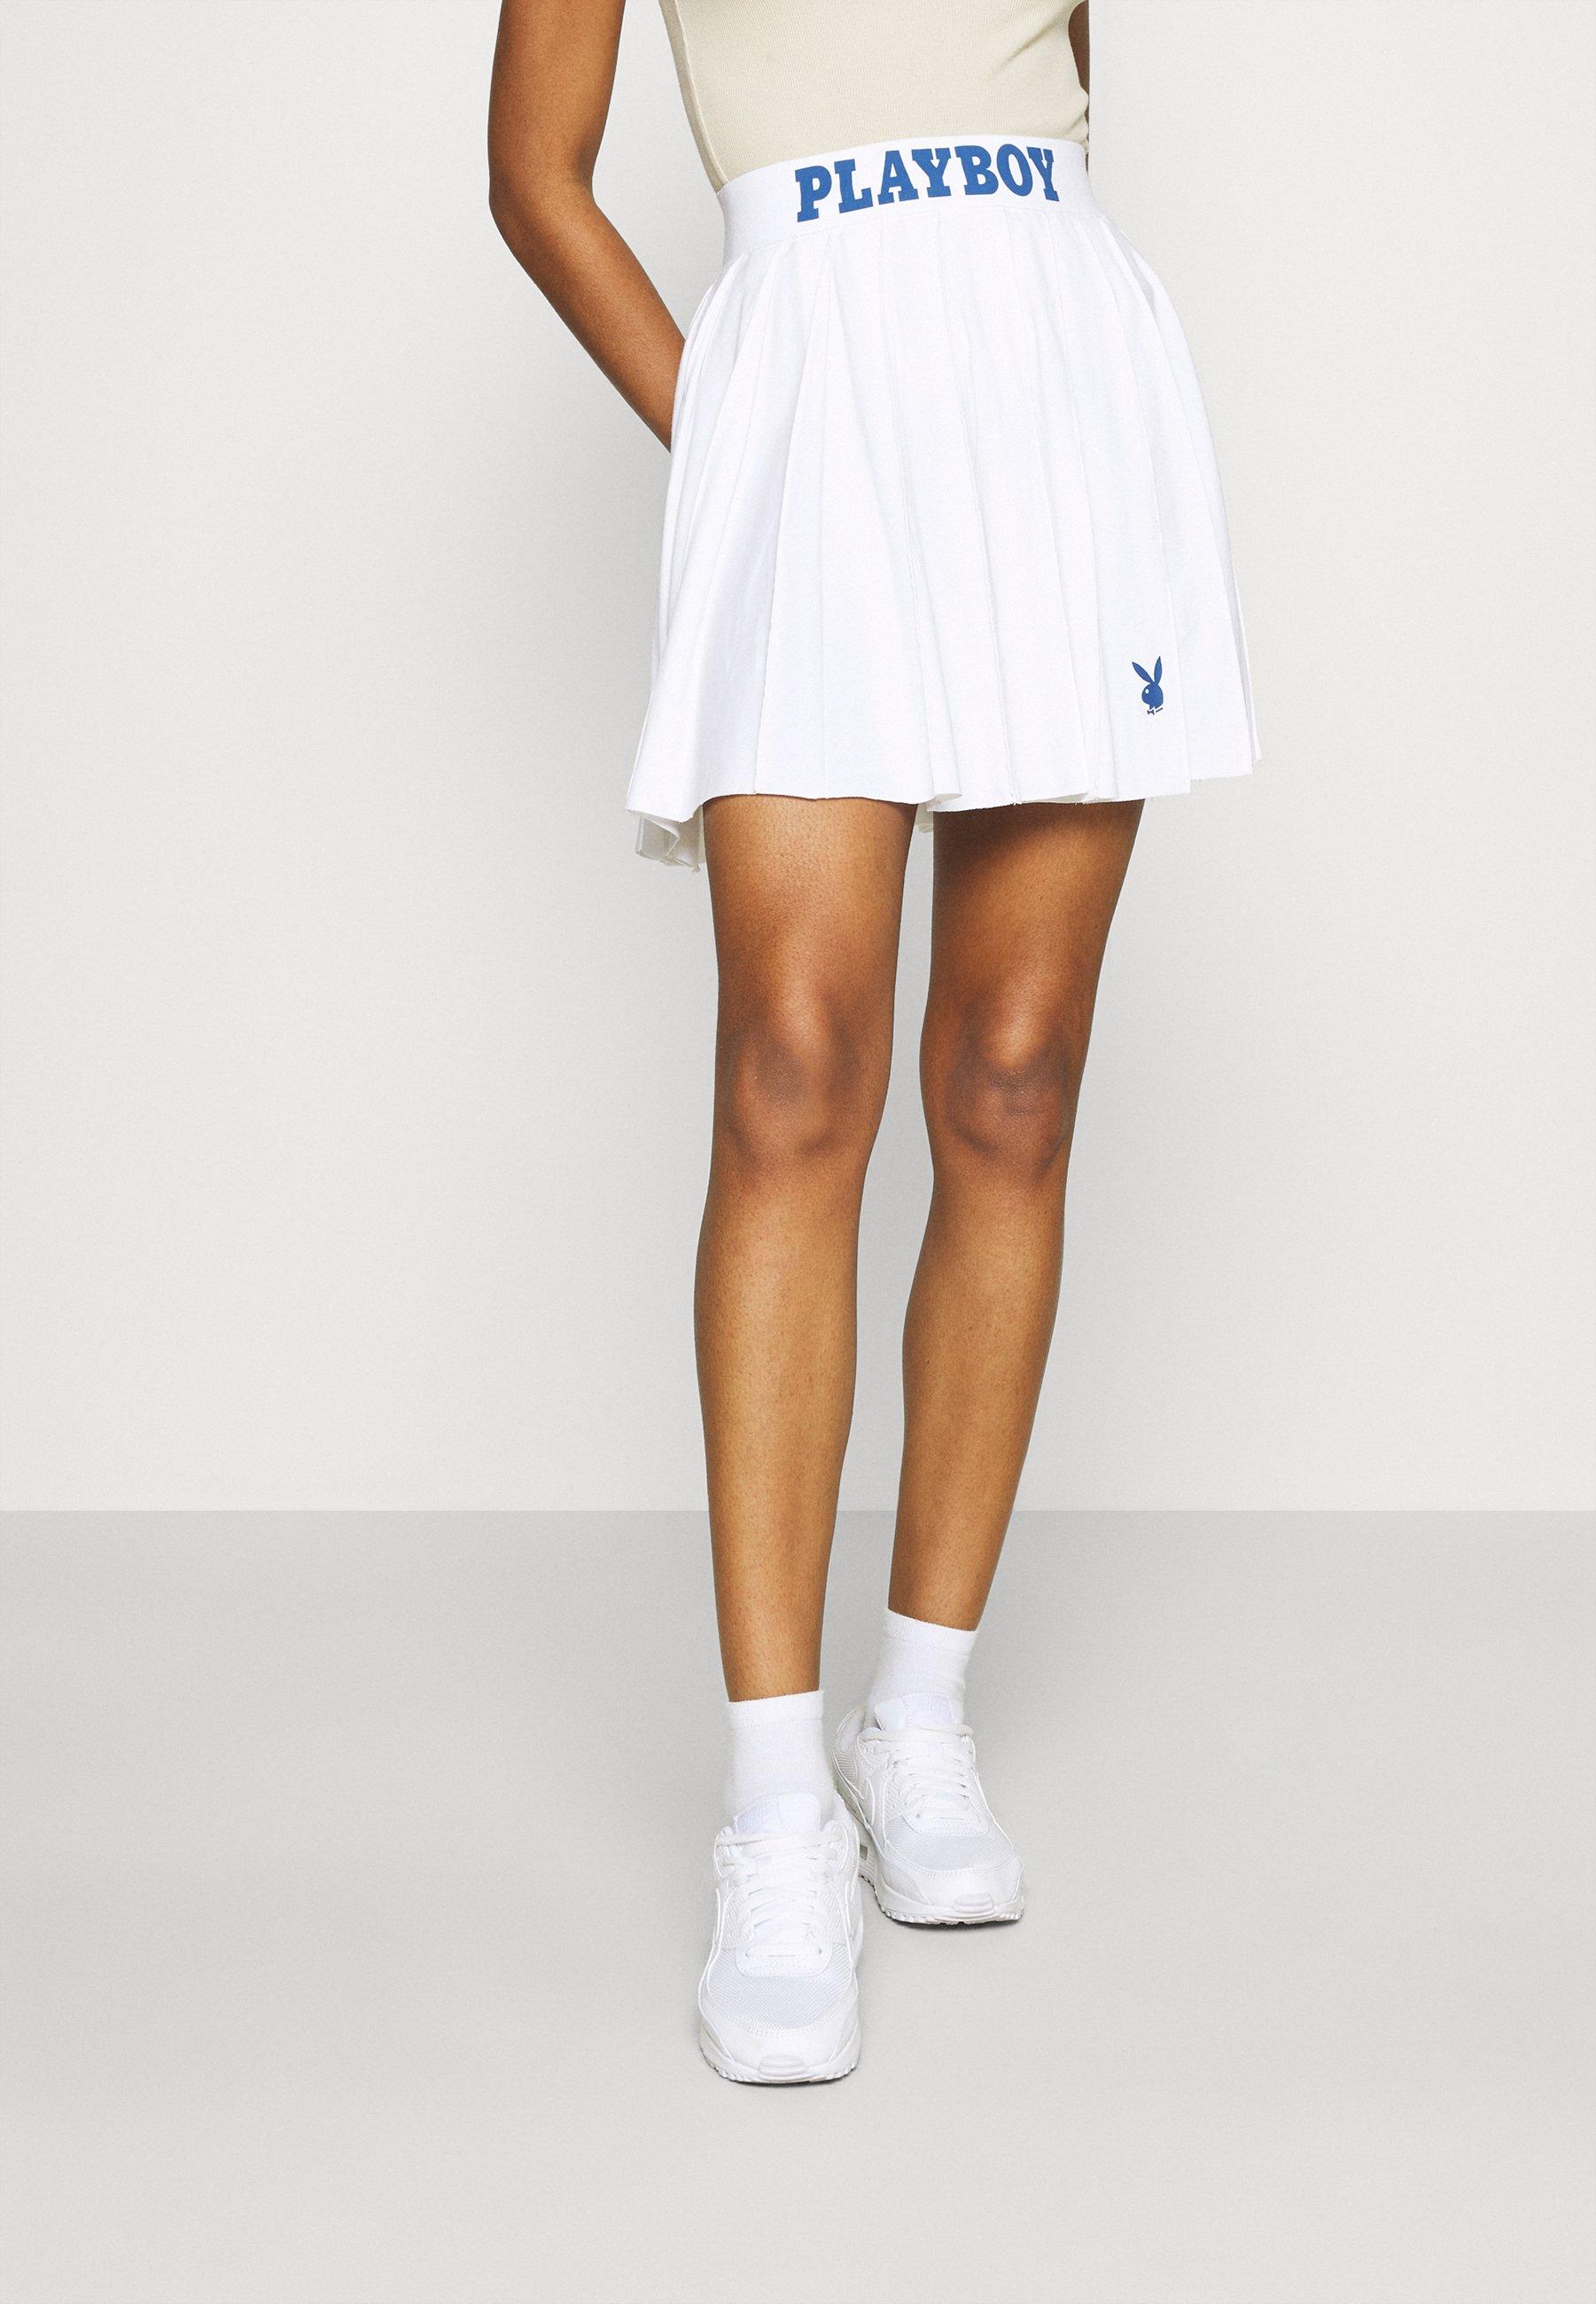 Donna PLAYBOY SPORTS TENNIS SKIRT - Minigonna